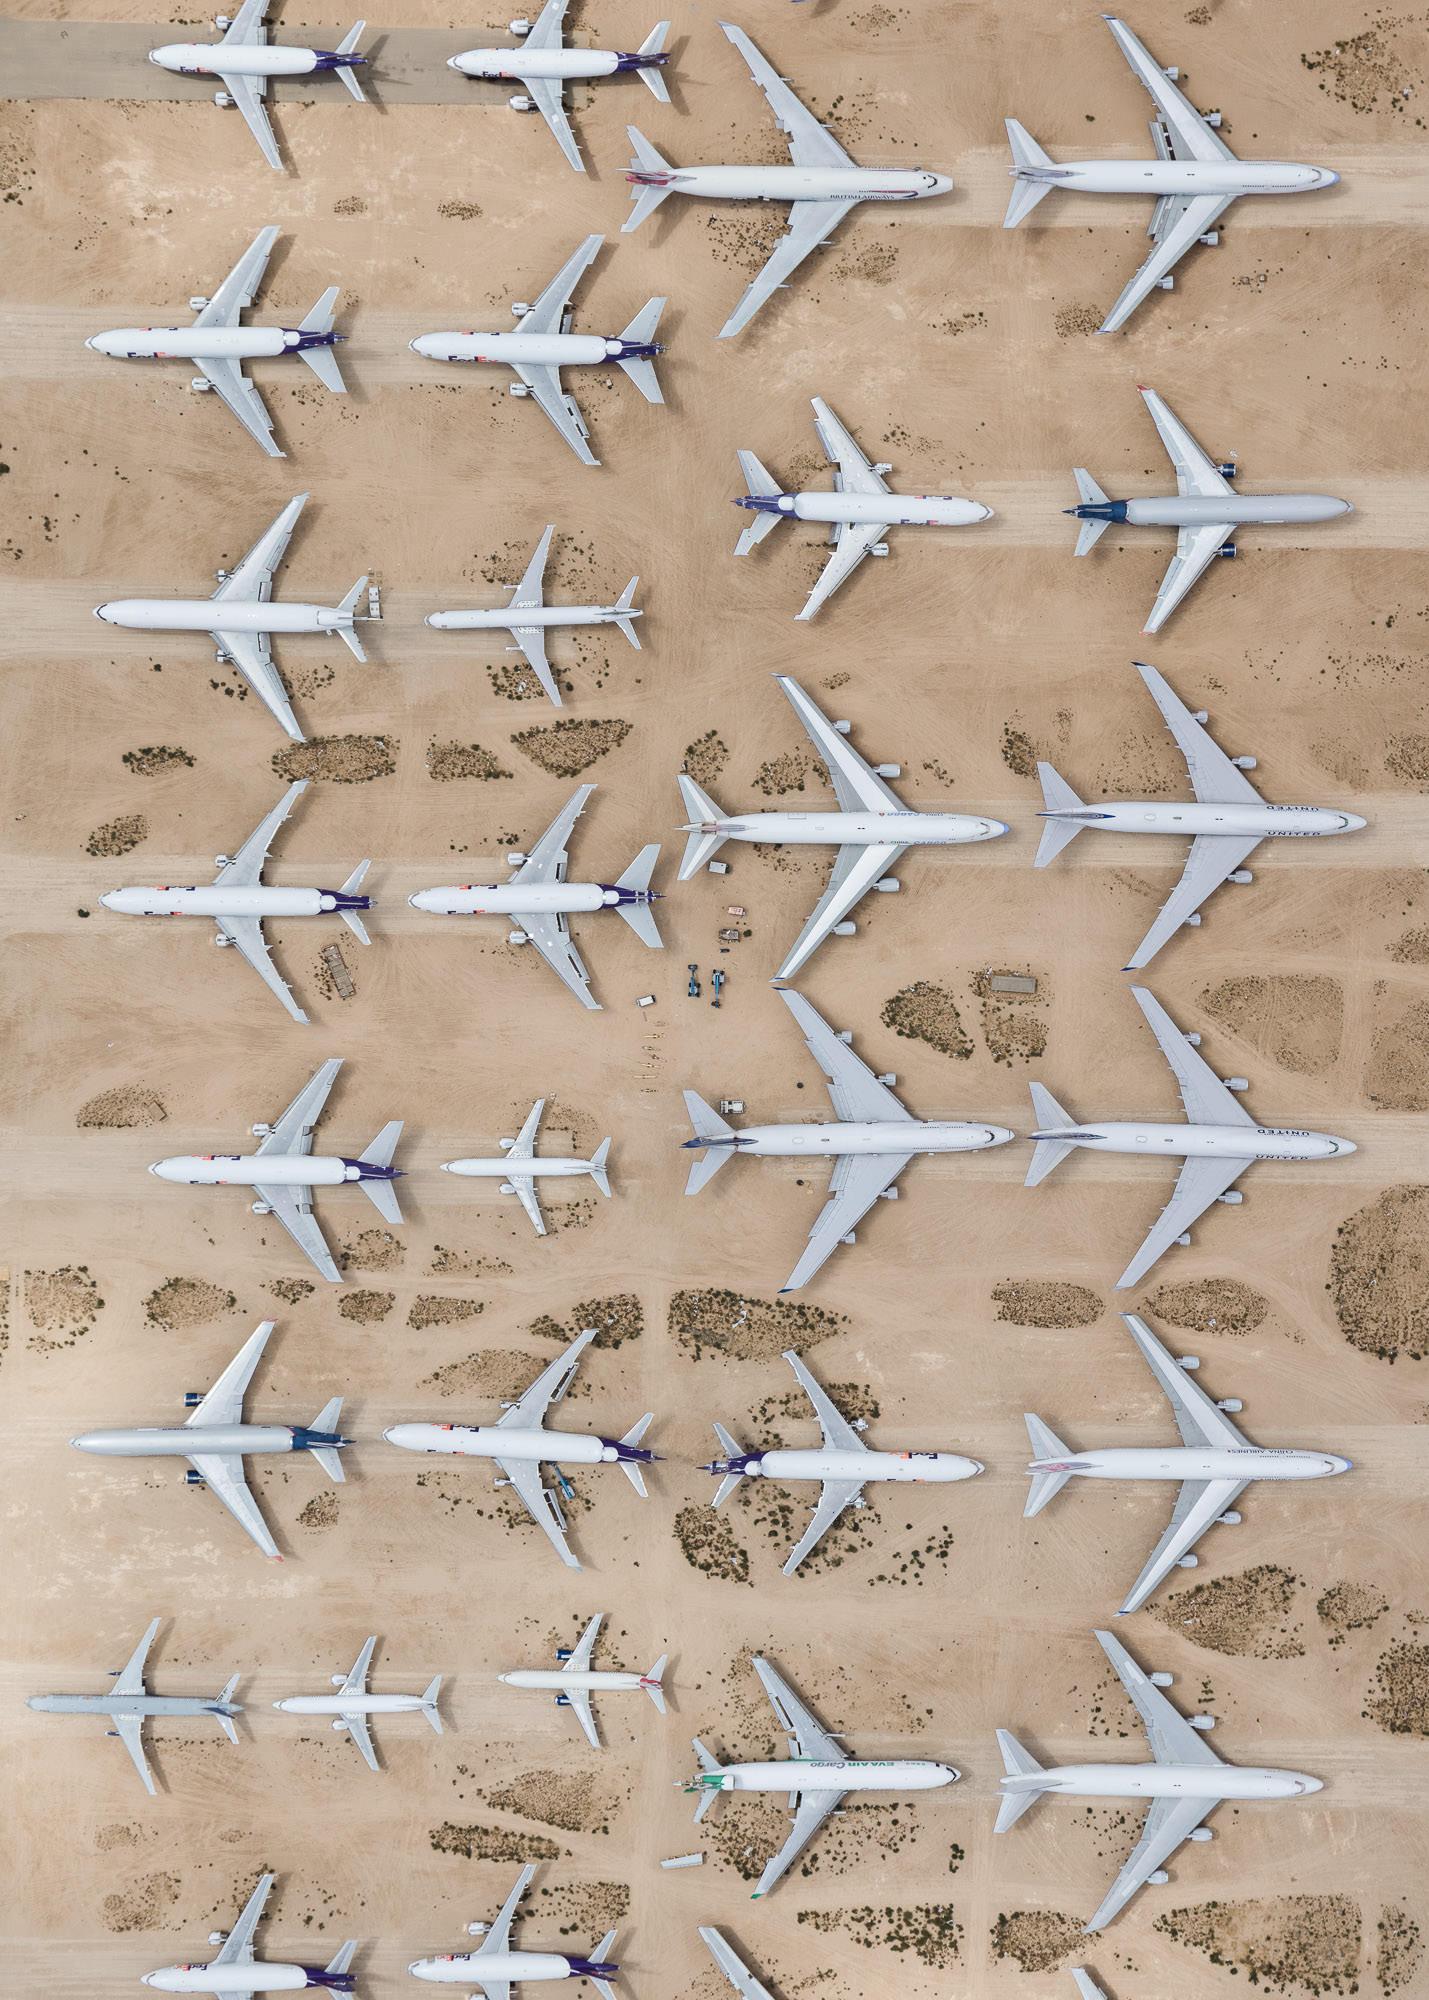 mike-kelley-life-cycles-aviation-16.jpg